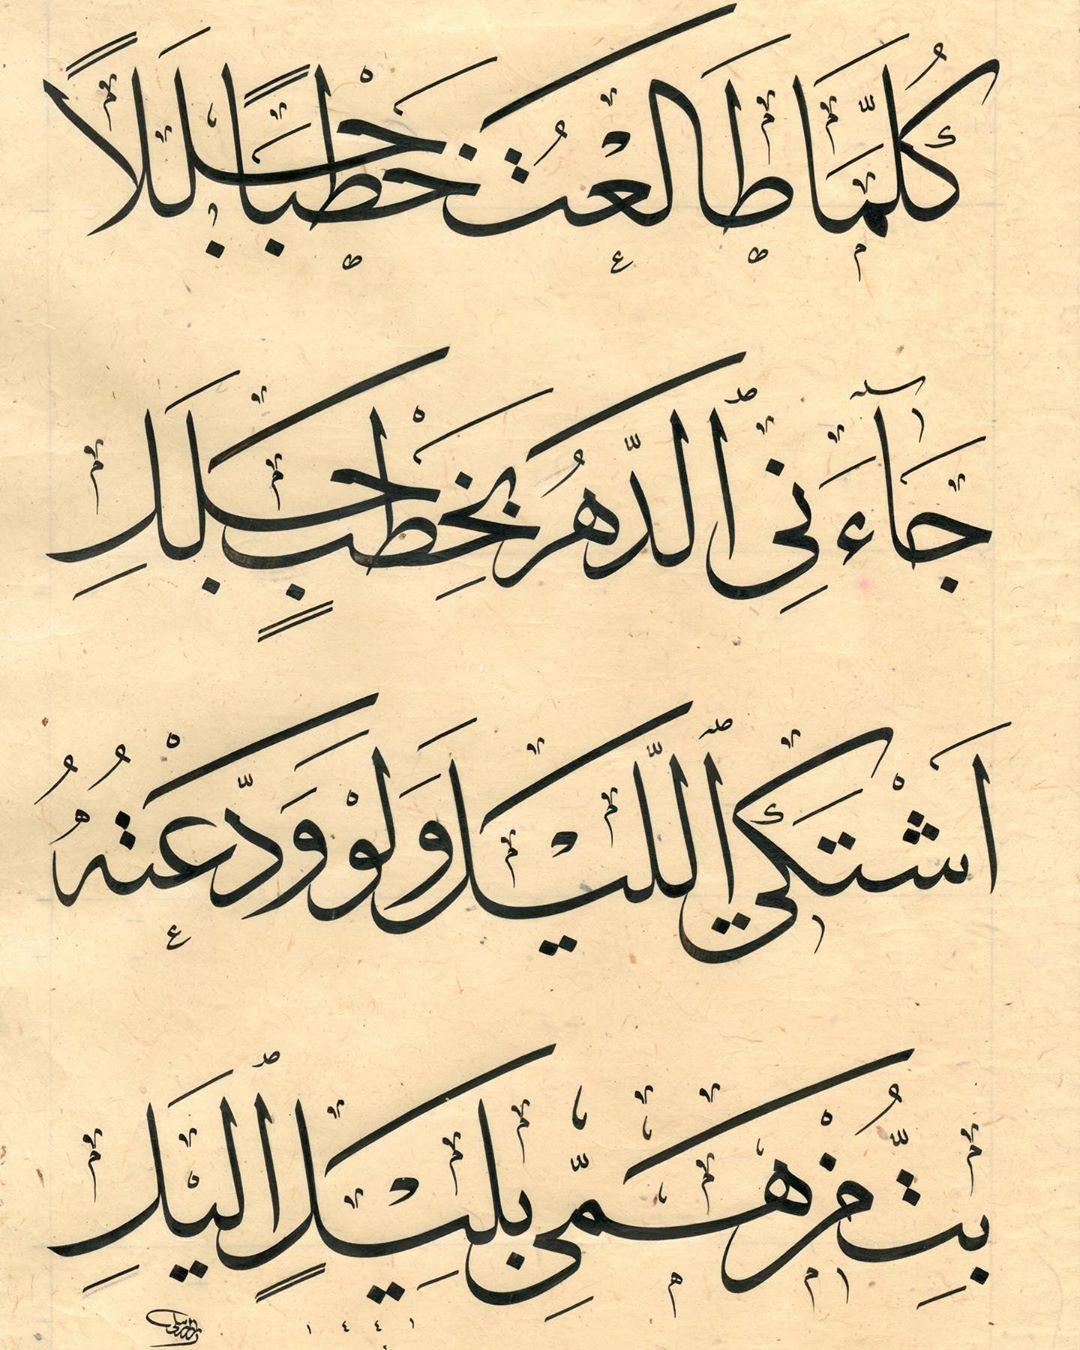 Professional Calligrapher Bijar Arbilly Calligraphy  يسعد صباحكم… من اشعار إيليا ابو ماضي #calligraphy #kunst #art #tehran #istanbu… 418